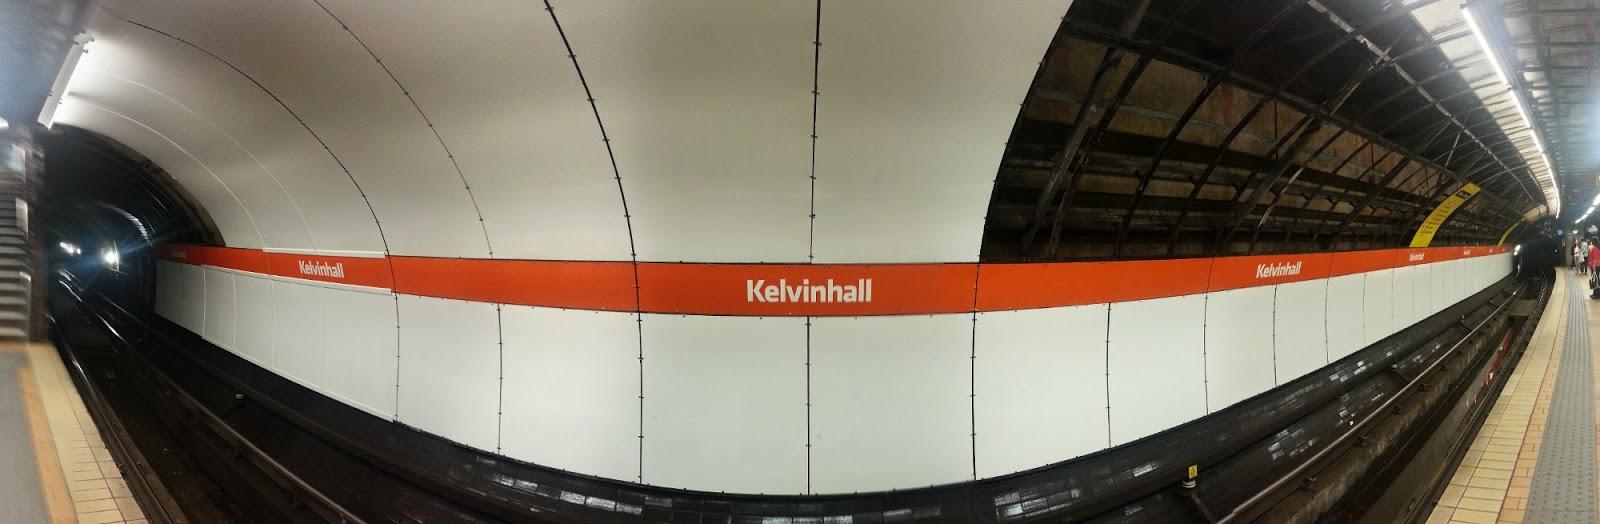 Kelvinhall Underground Station,Glasgow